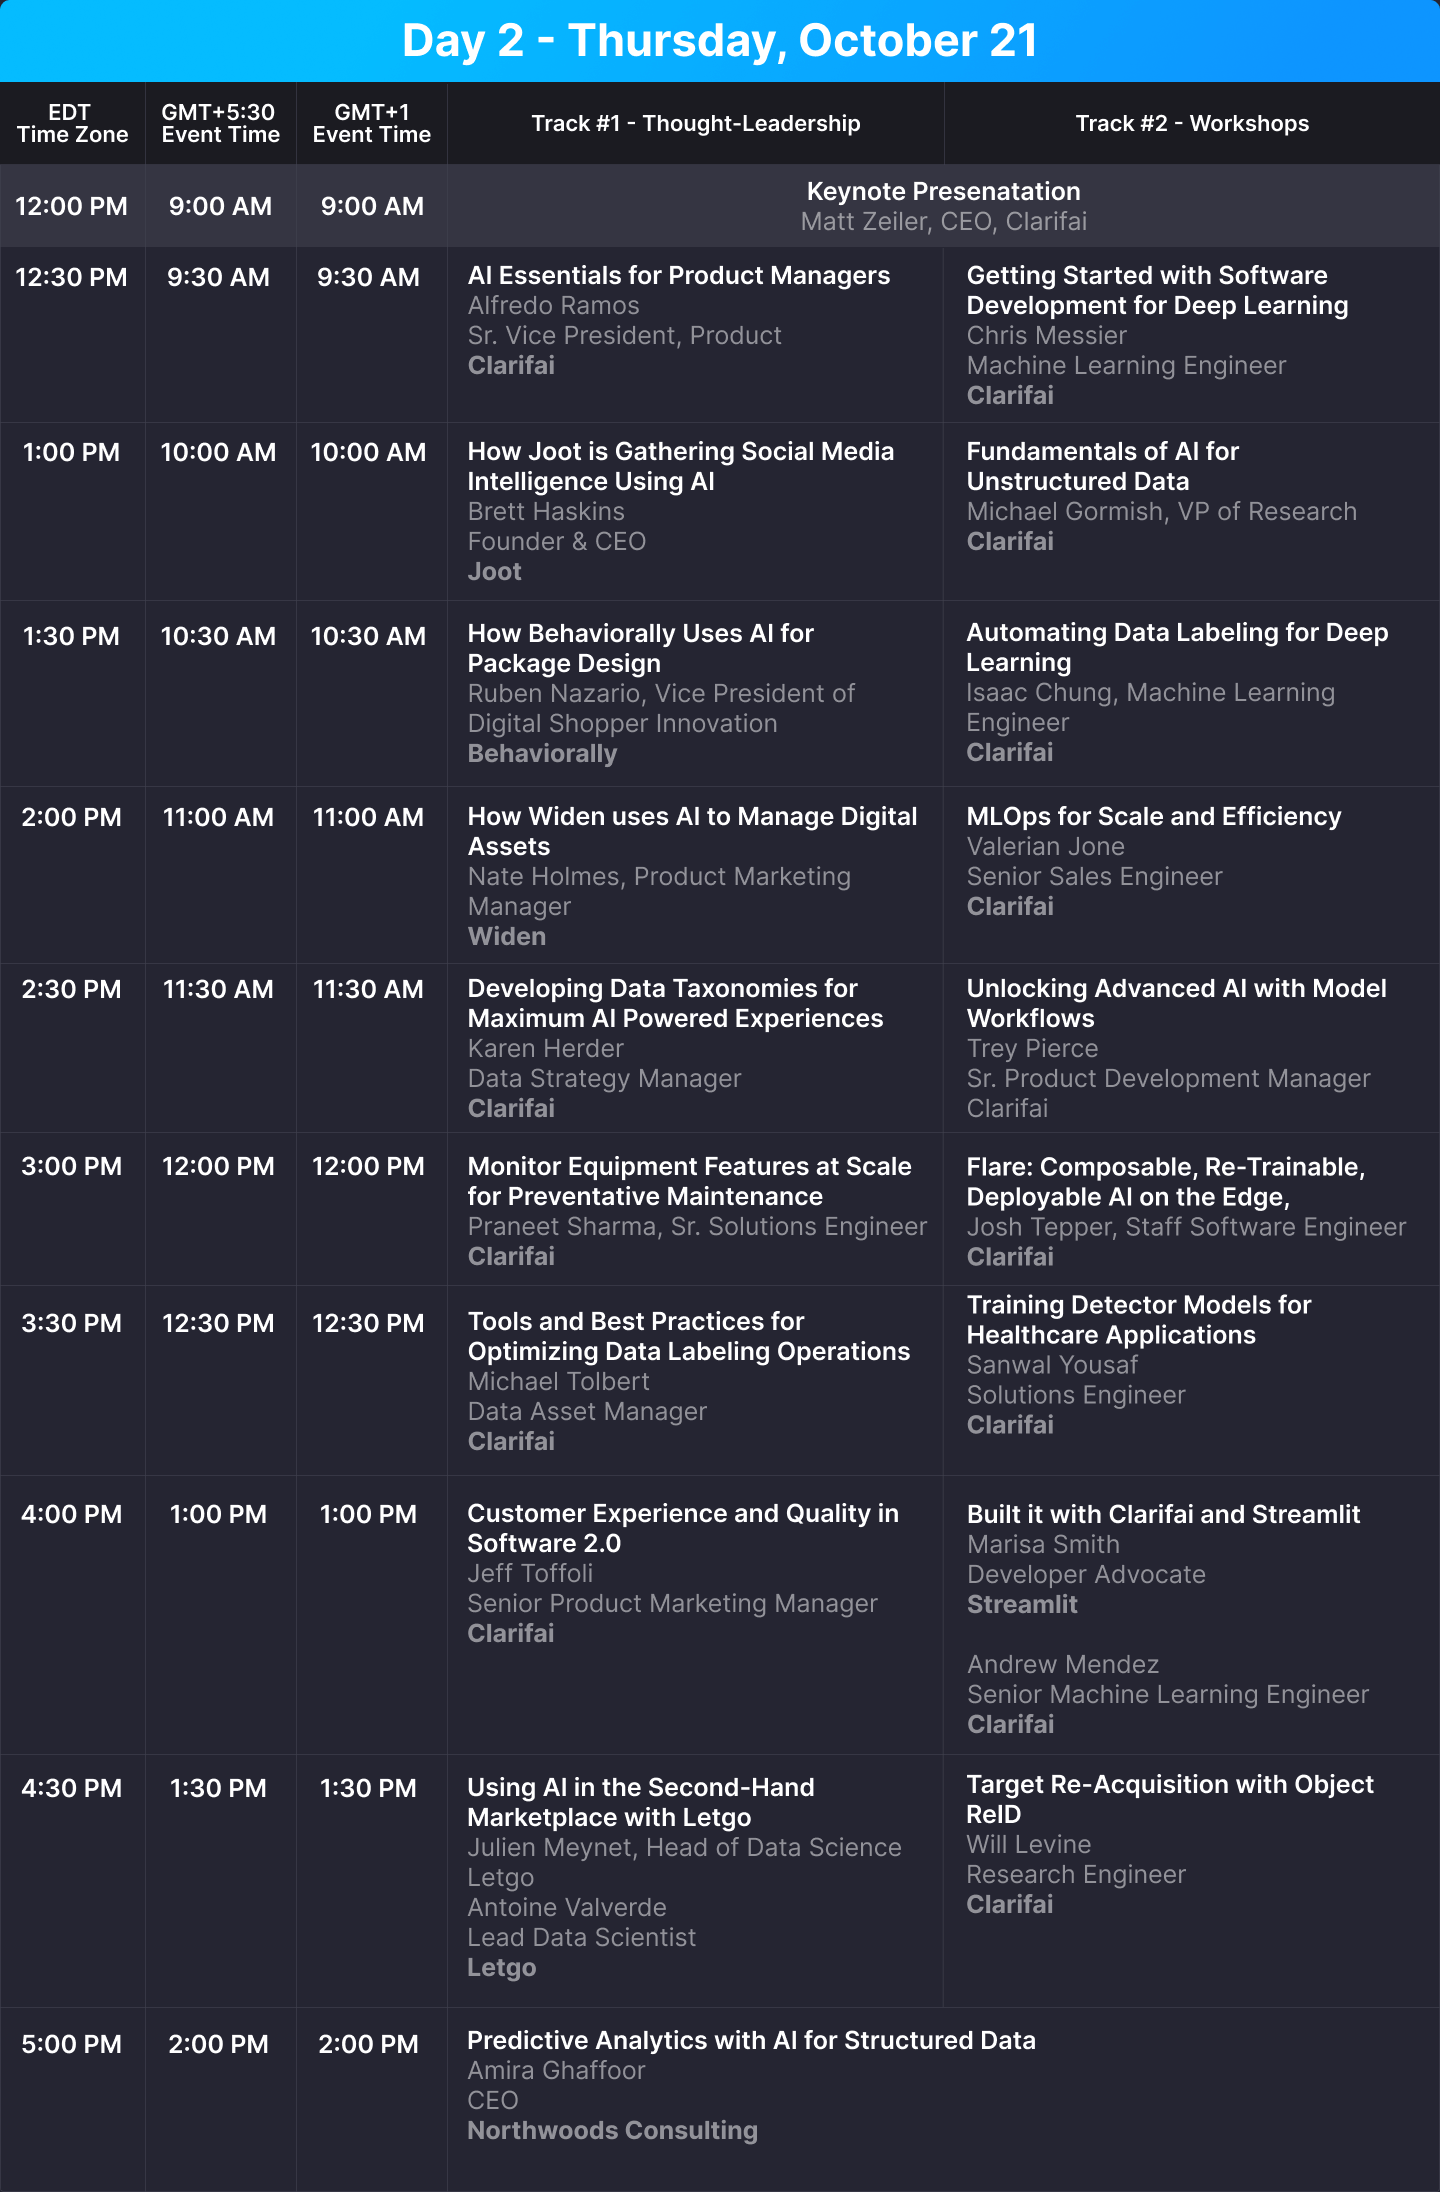 perceive-day-2-agenda